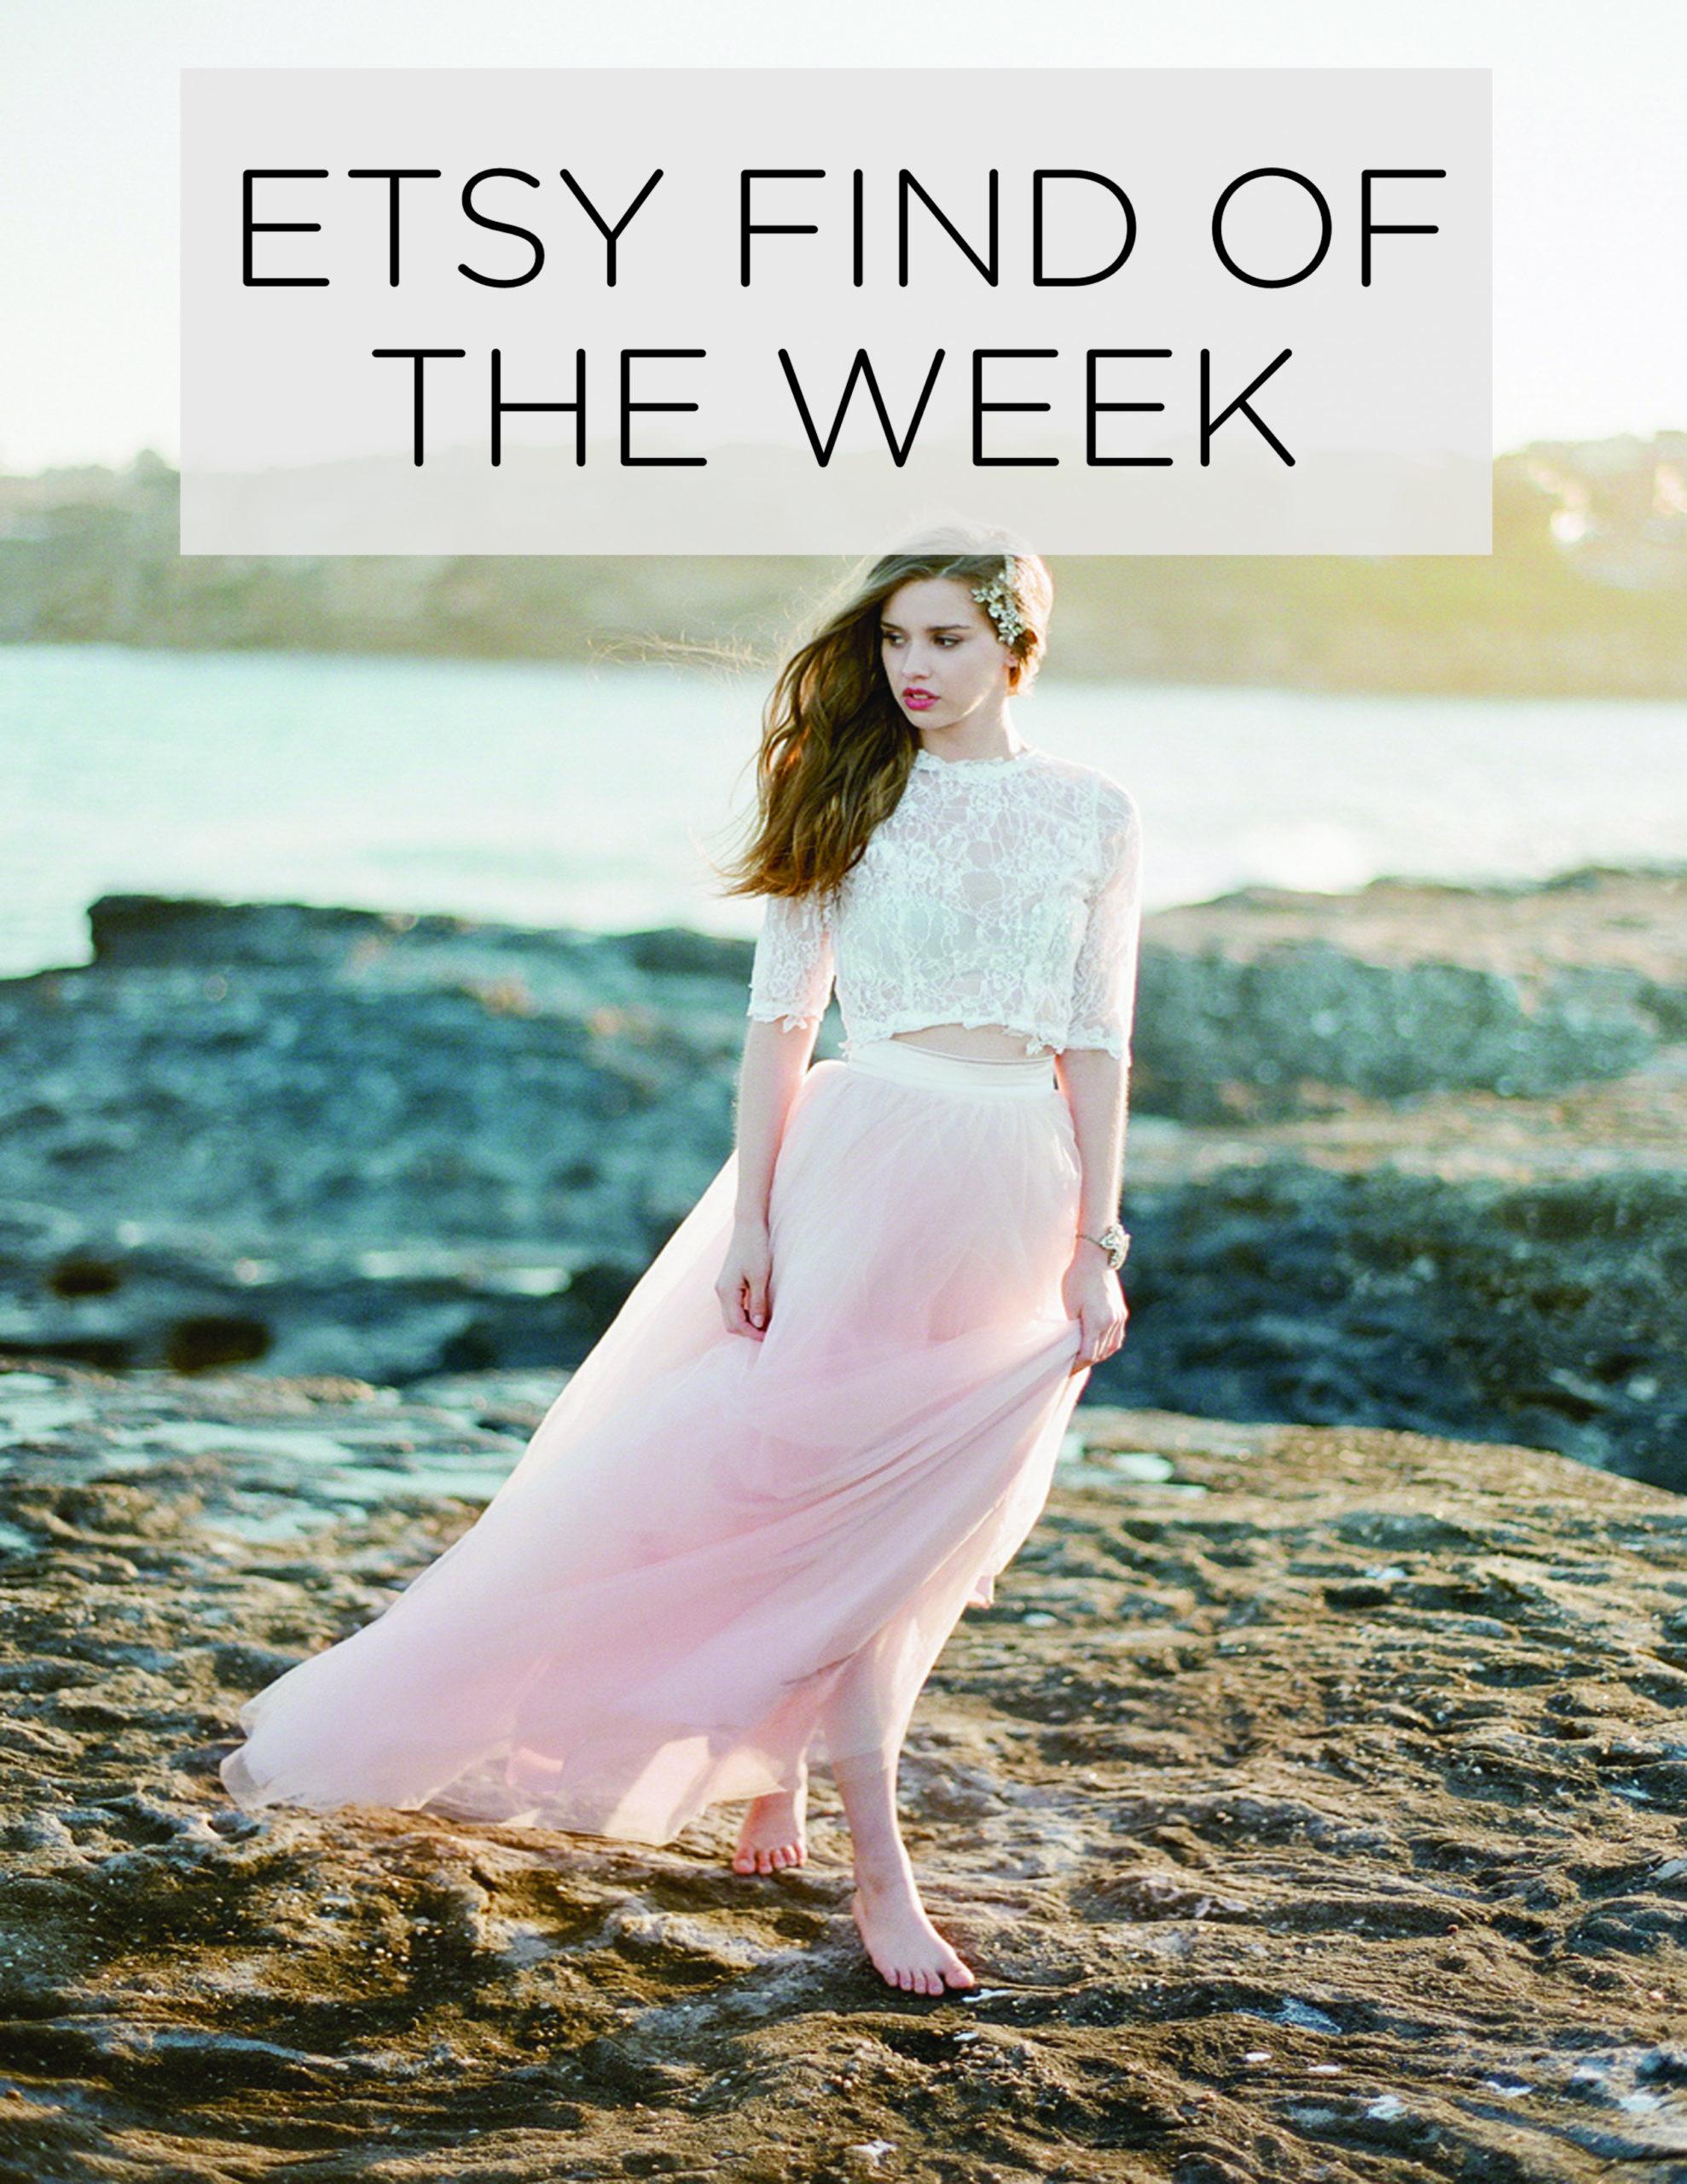 Etsy Find of the Week – Bride La Boheme